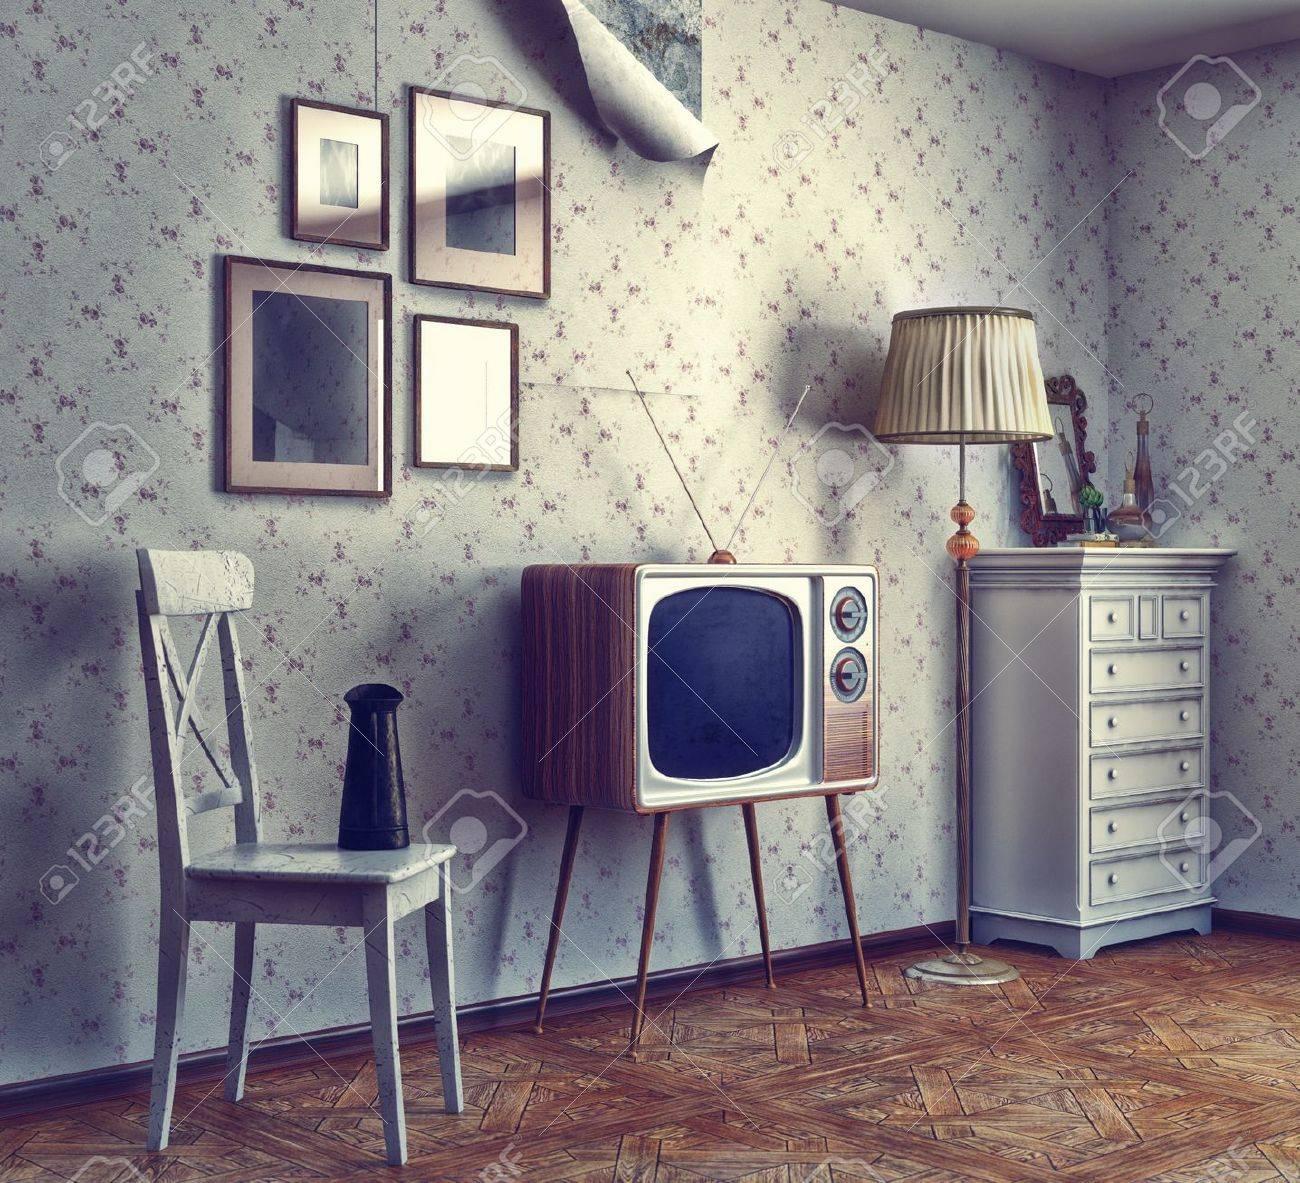 Obsolete Retro Interior Photo And Cg Elements Combinated Texture Grain Add Stock